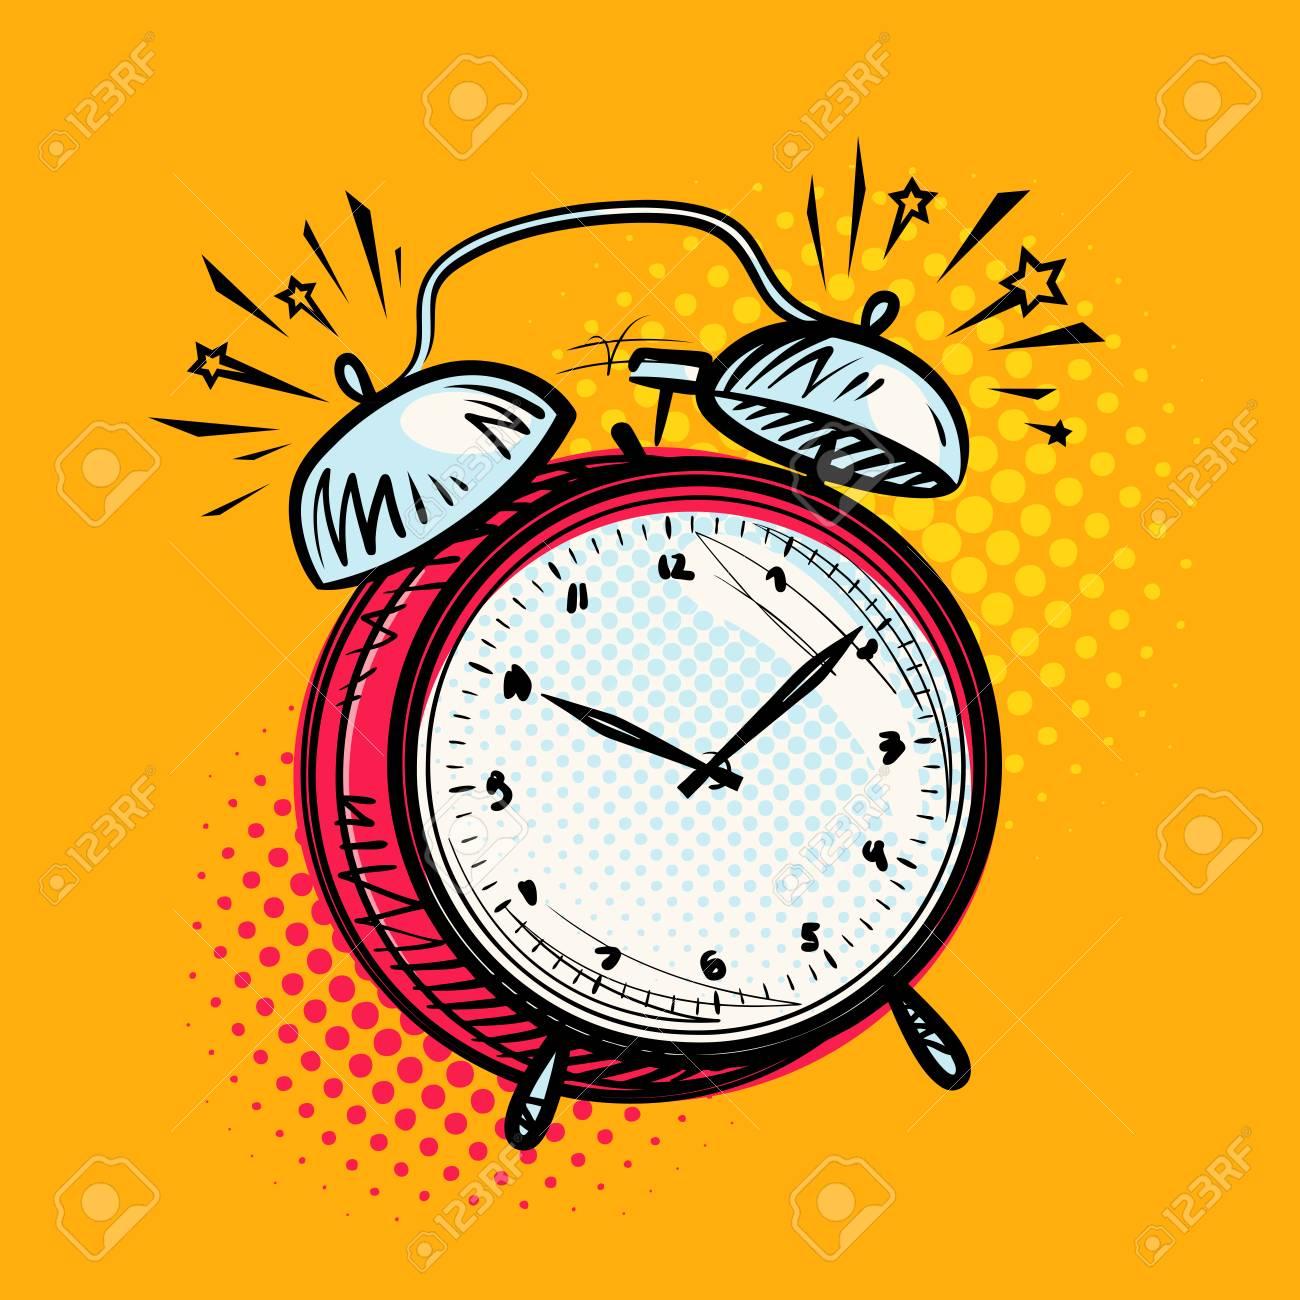 Alarm clock is ringing, wake-up call. Reminder, deadline concept. Vector illustration - 96130265